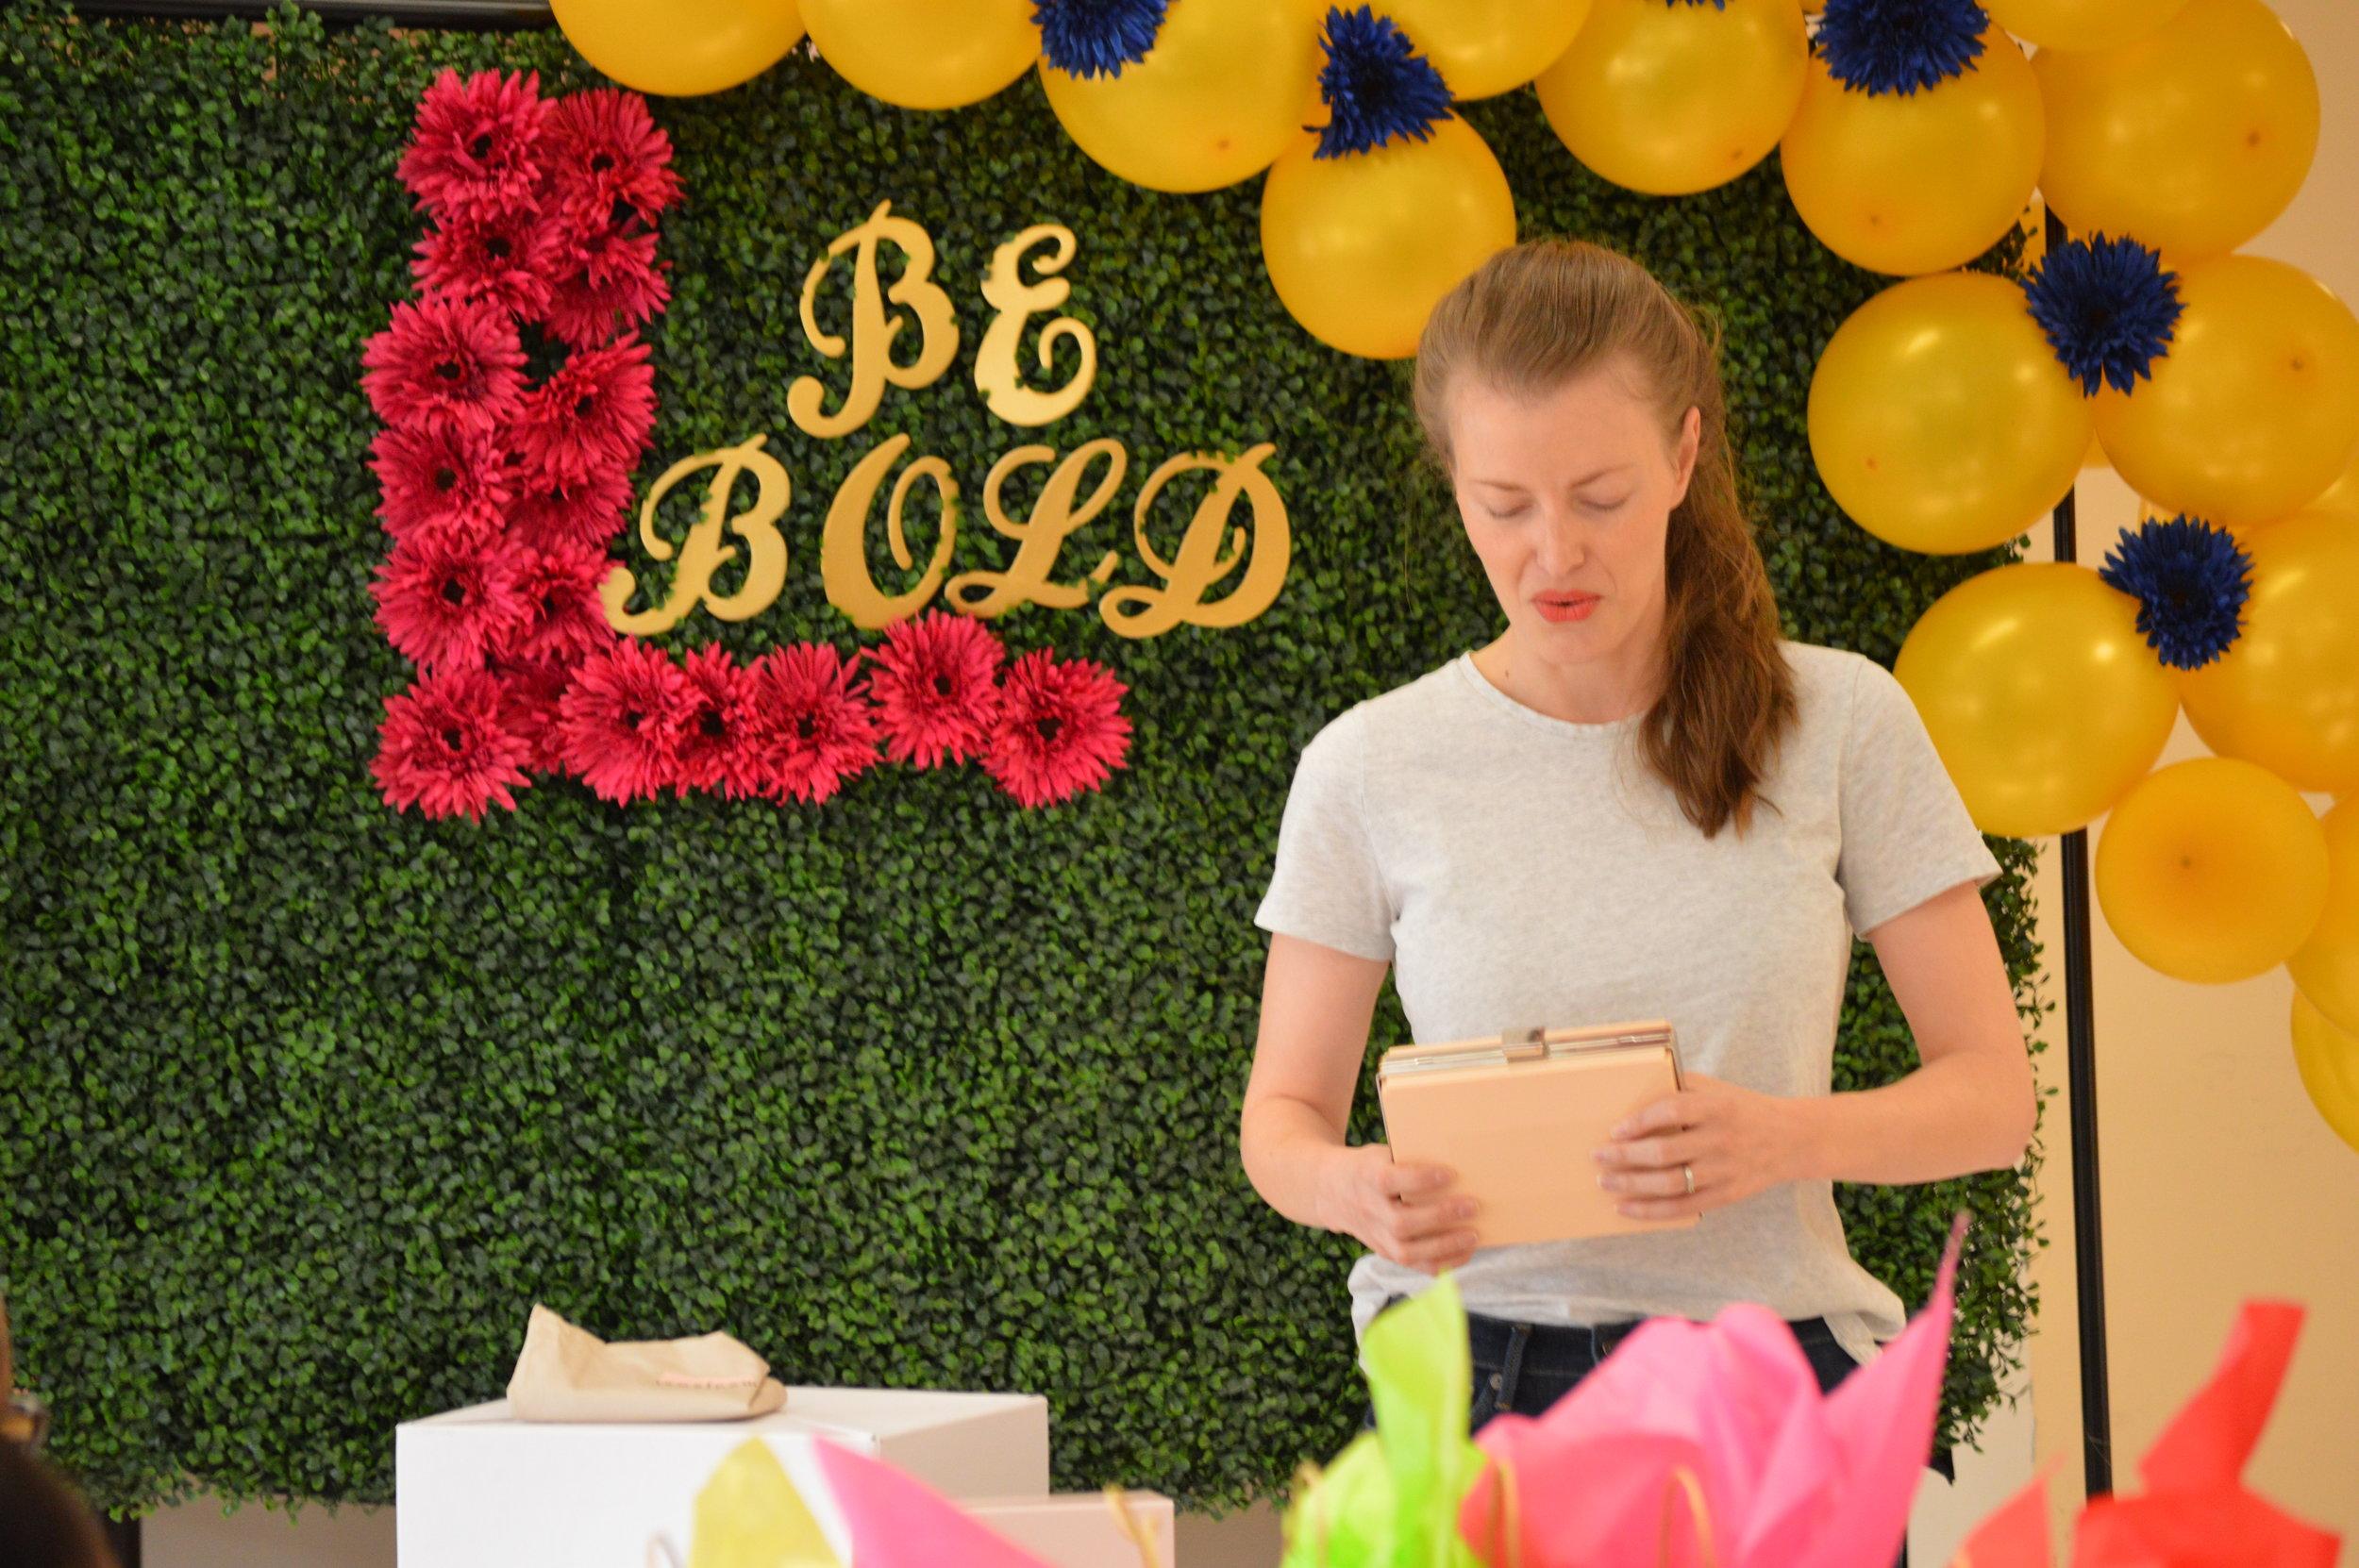 Eliana, CEO of Mod Jewel Handbags